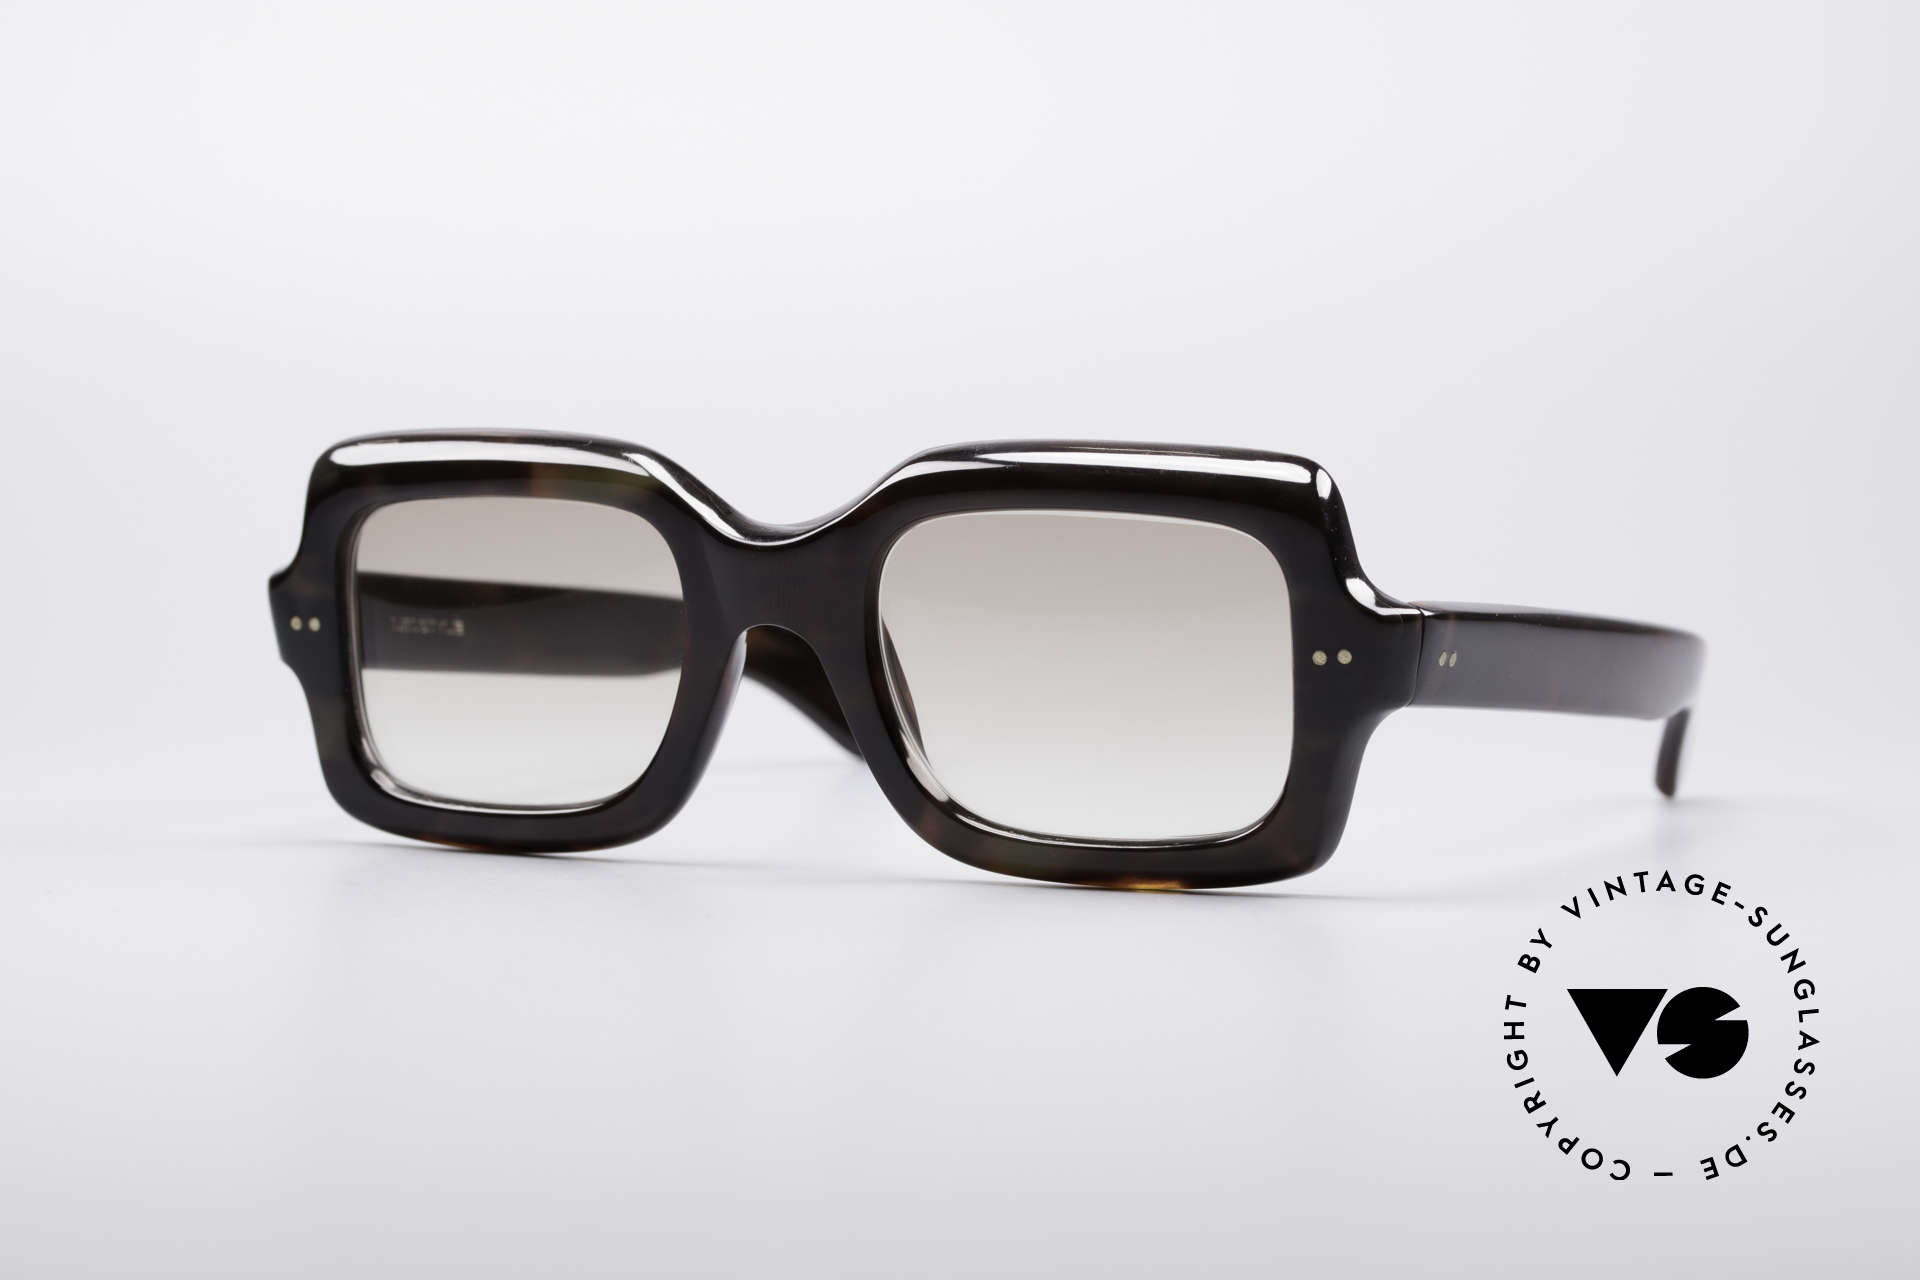 804a3a6c5ad Sunglasses Neostyle Capua Genuine Tortoise Shell Frame